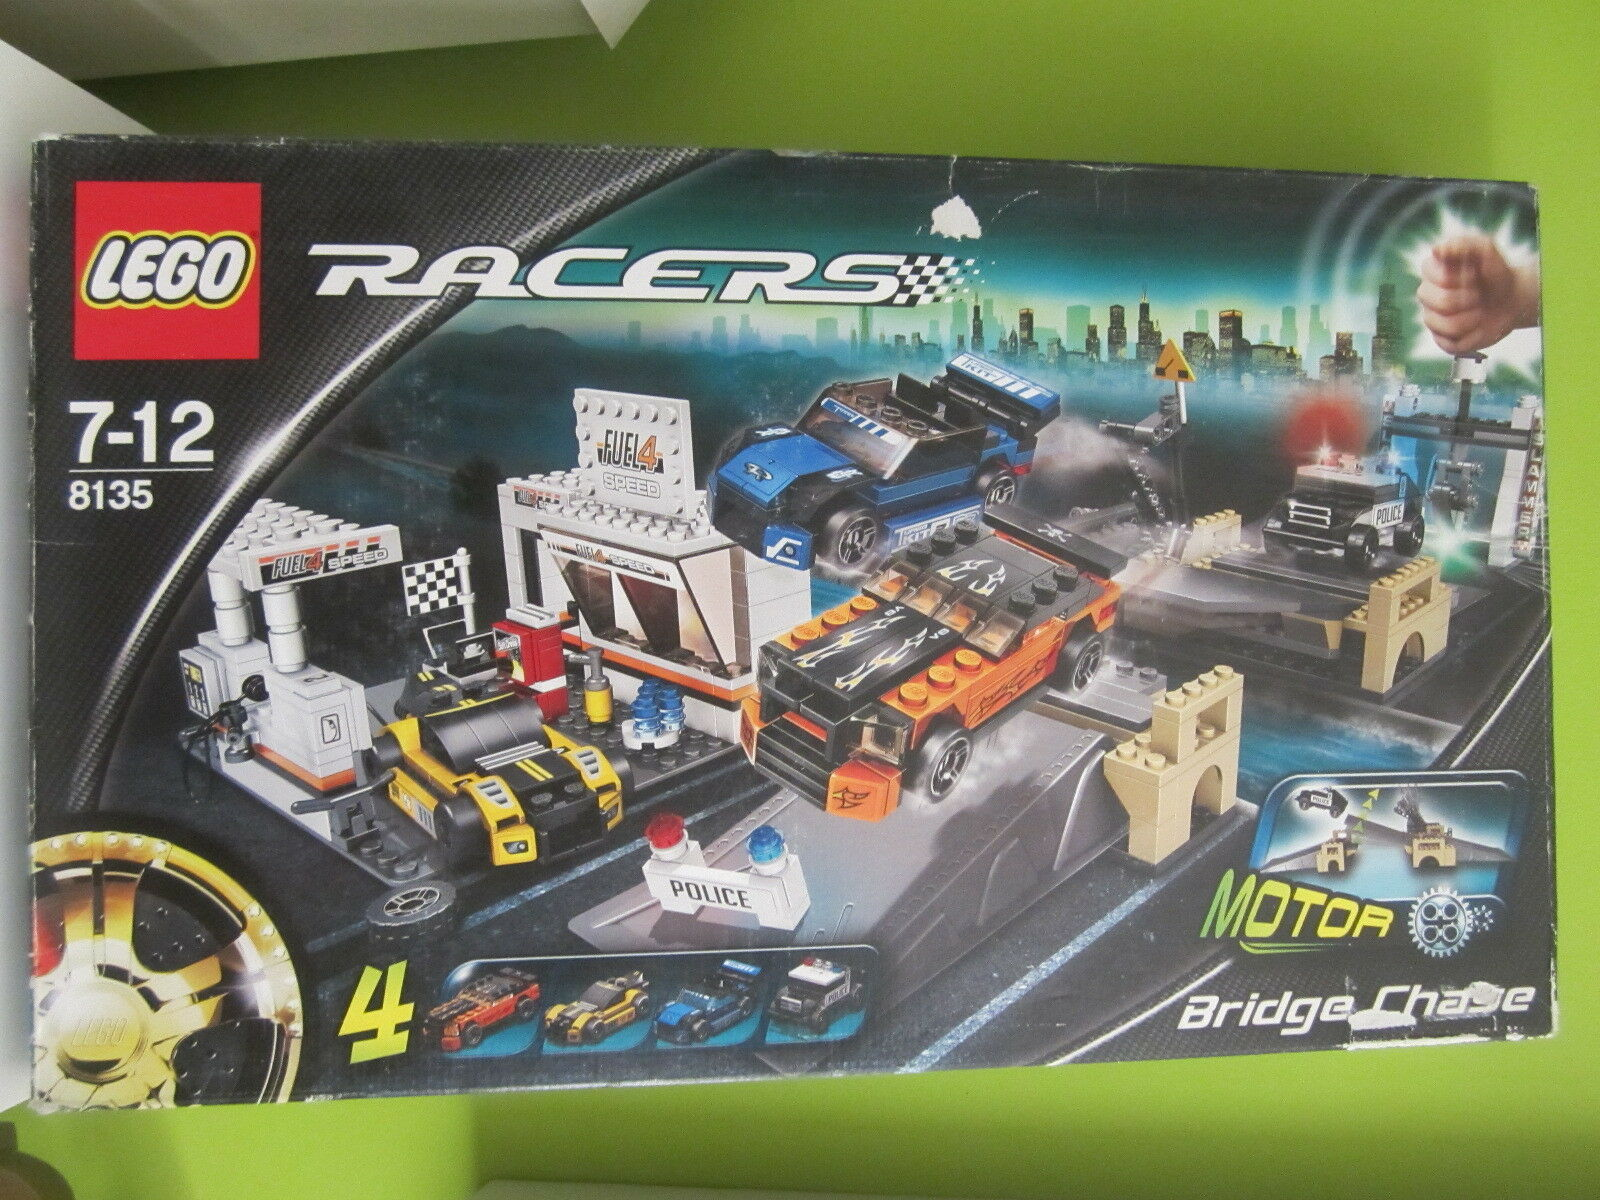 LEGO AÑO 2007 REFER 8135 RACERS   MOTOR BRIGDE CHASE